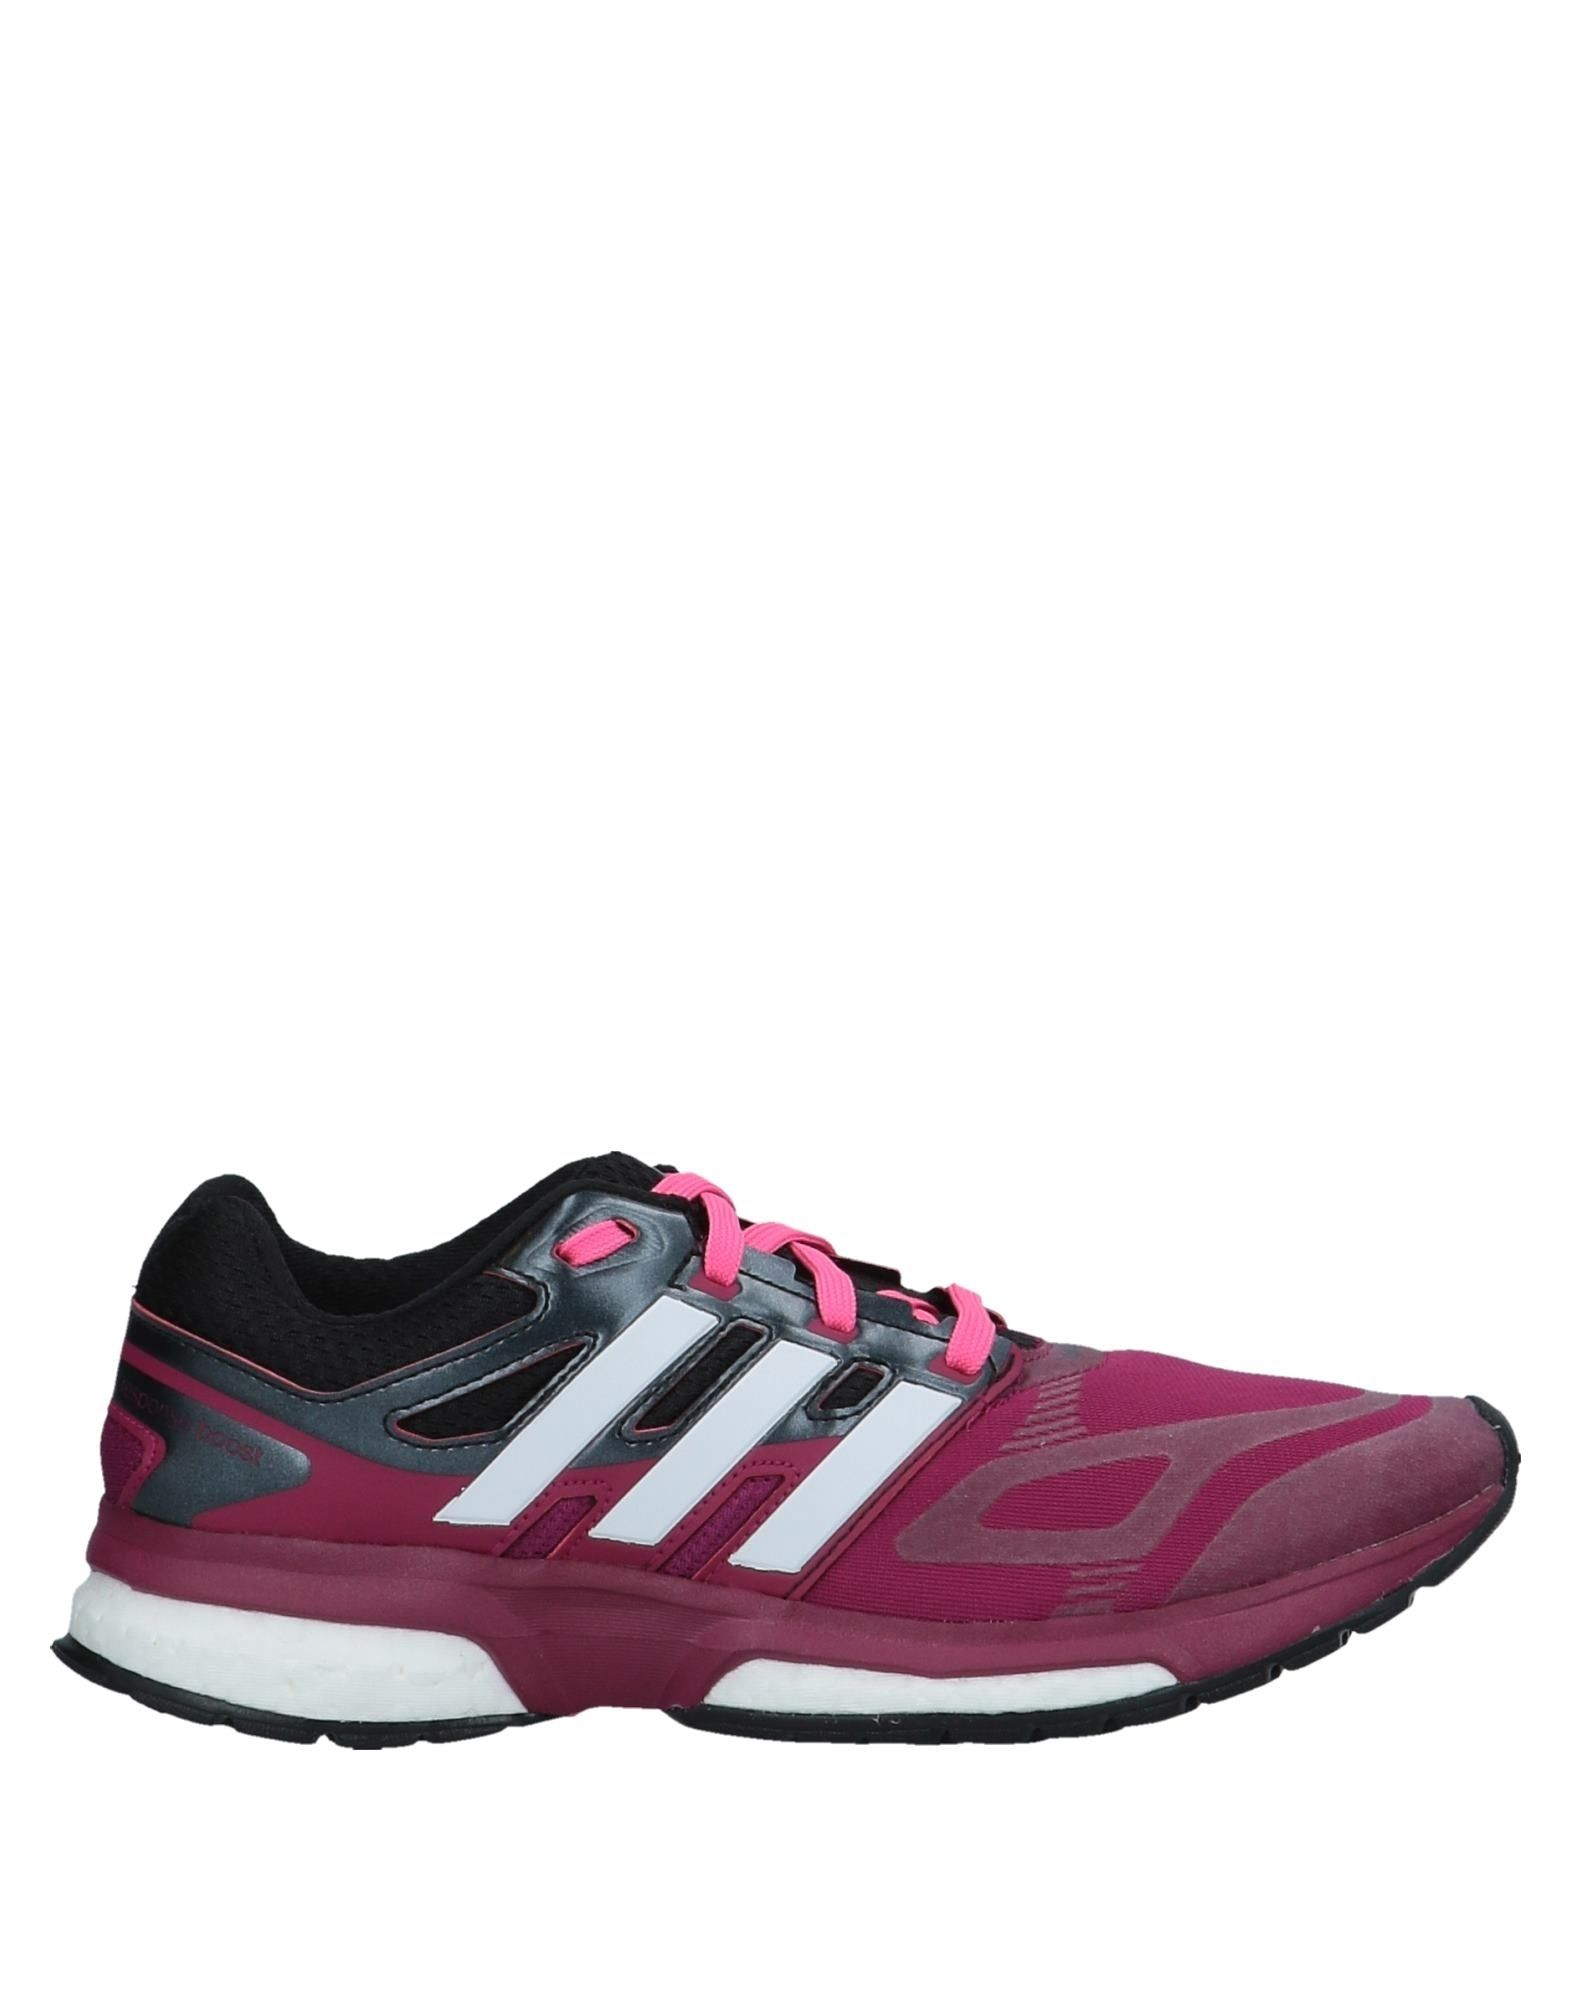 Sneakers Adidas Donna - 11538364WL elegante